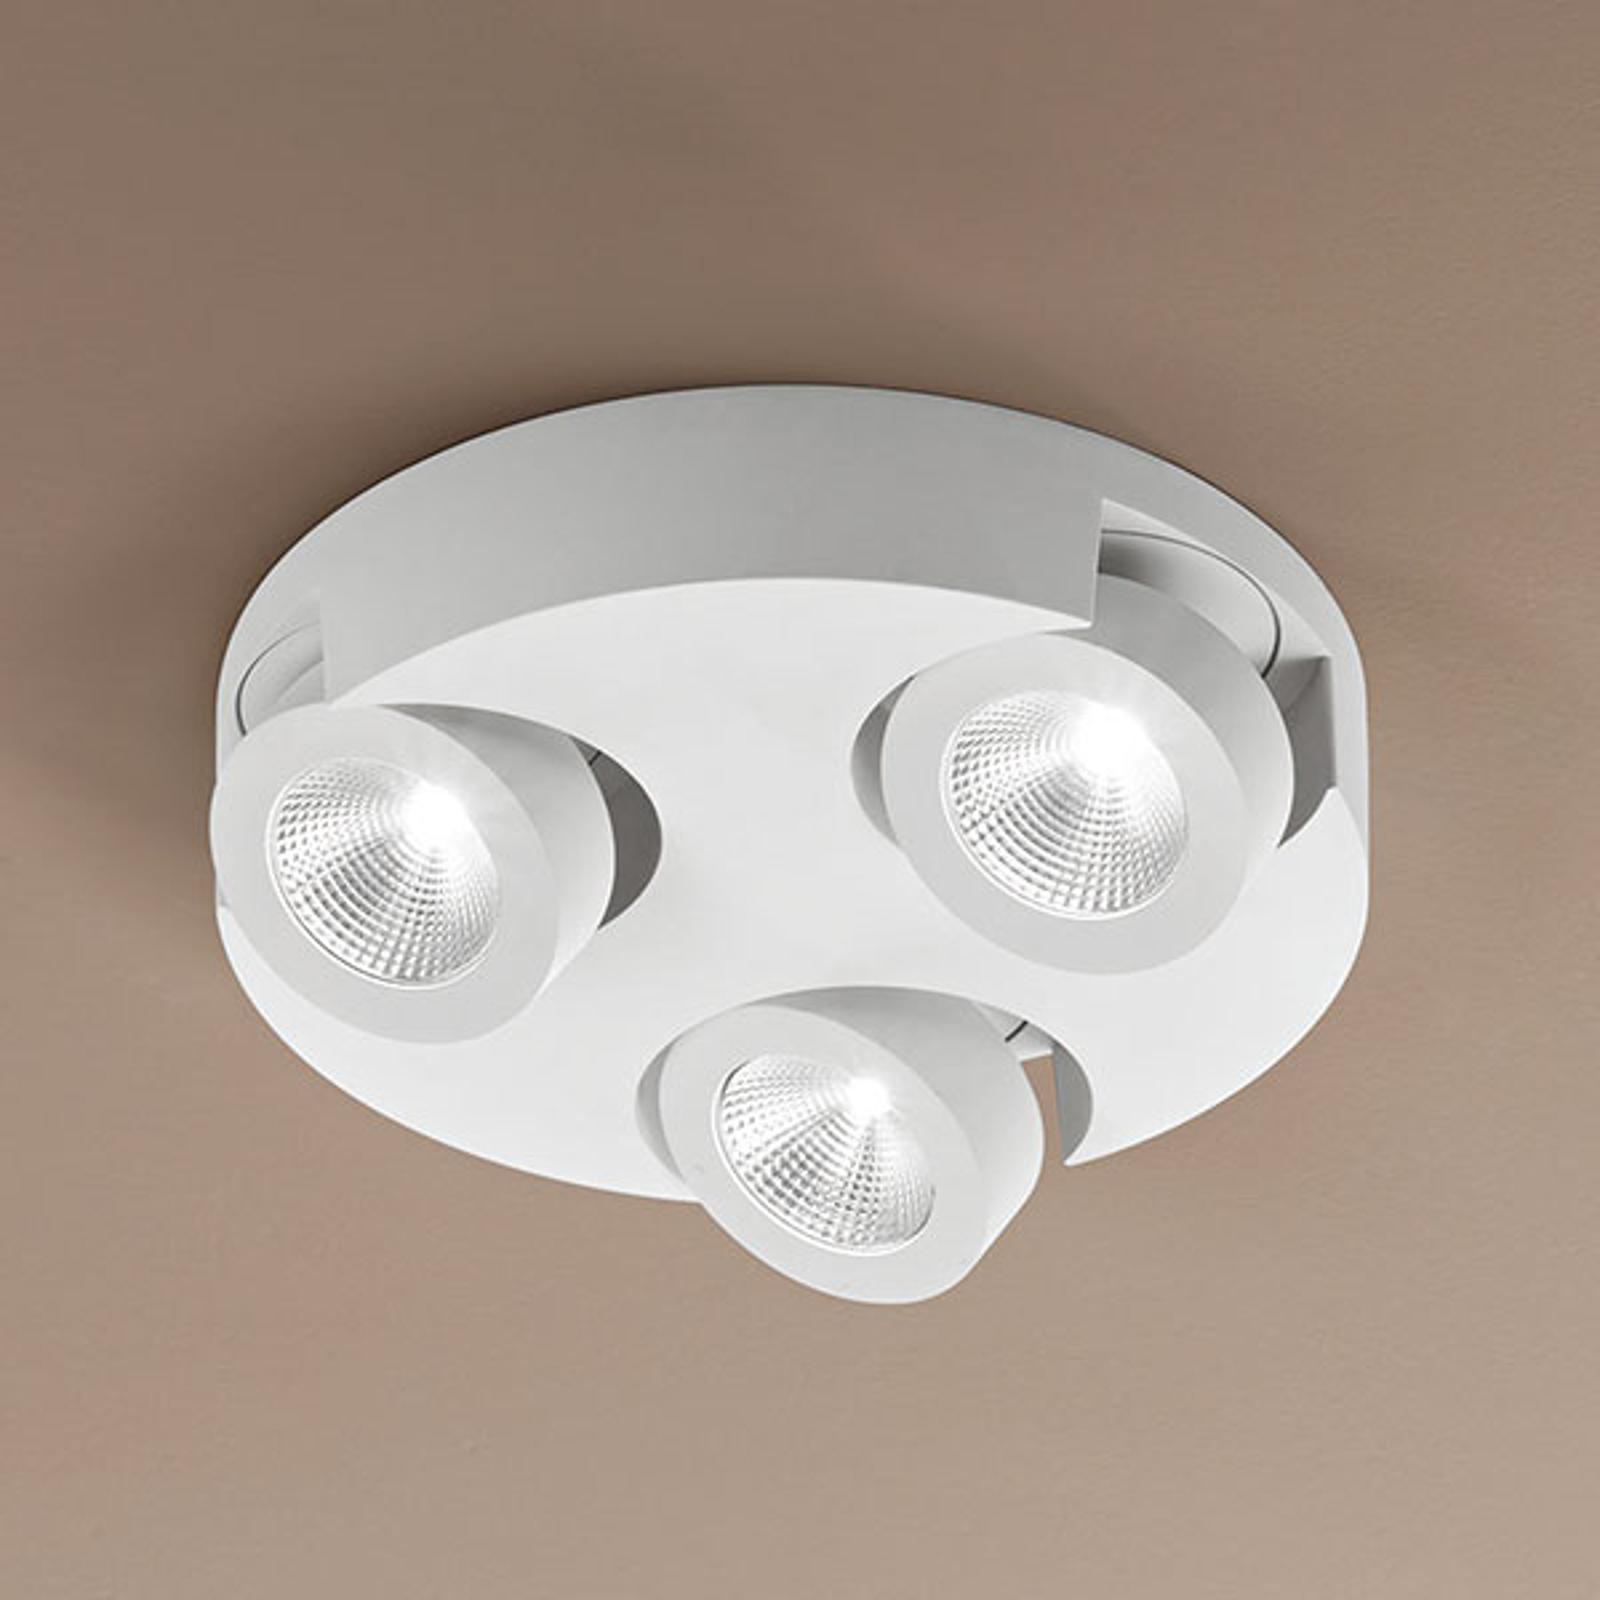 Ronde LED plafondlamp Hella